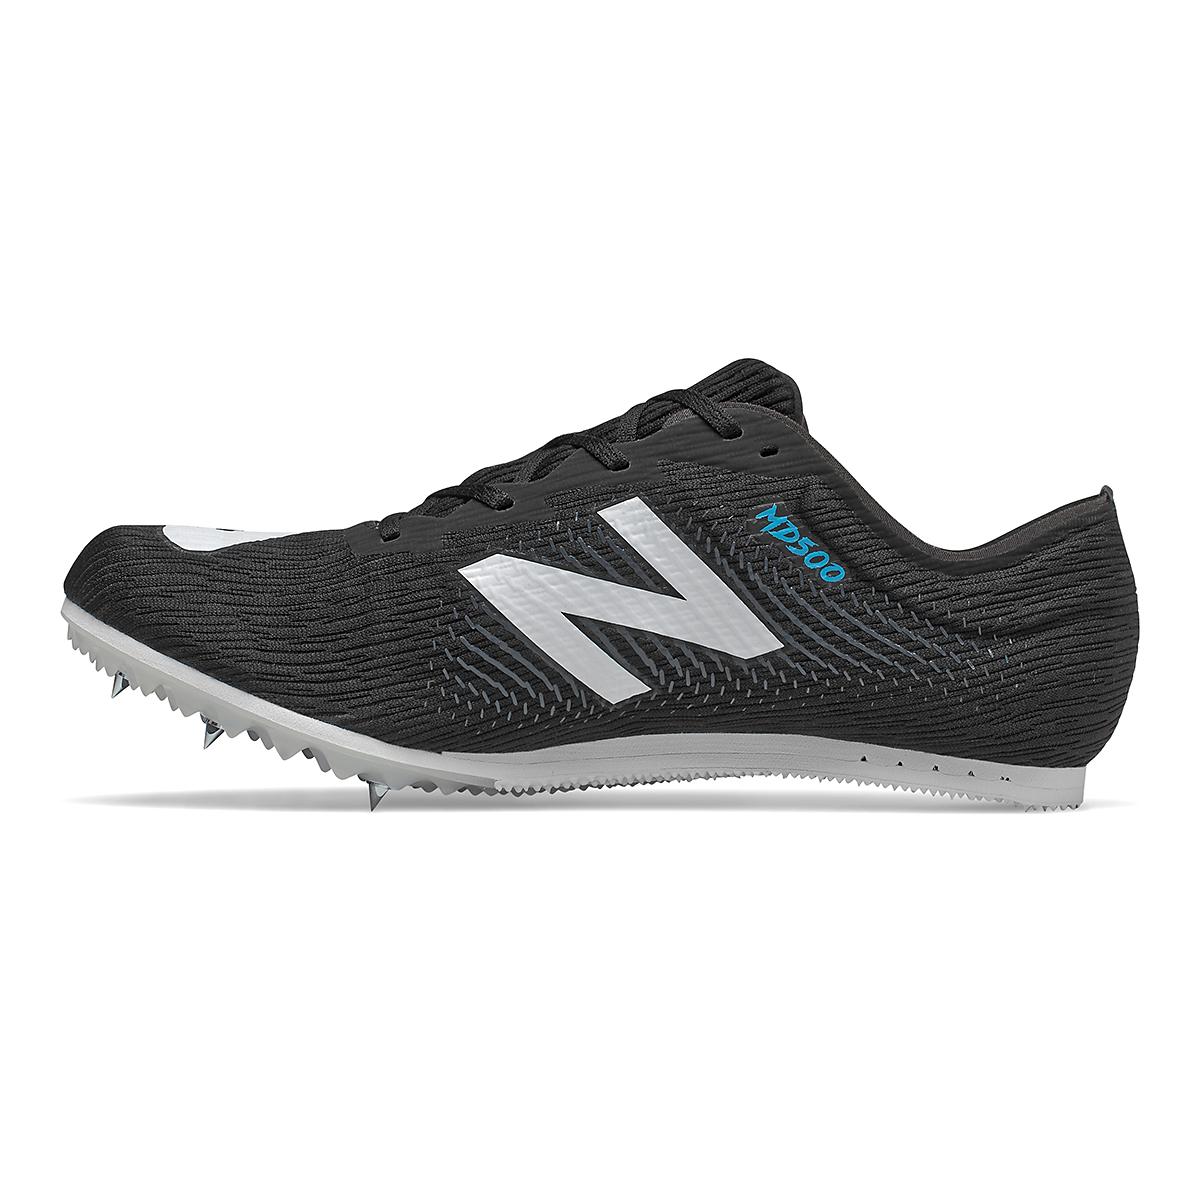 Men's New Balance MD500v7 Track Spikes - Color: Black/White - Size: 6.5 - Width: Regular, Black/White, large, image 2